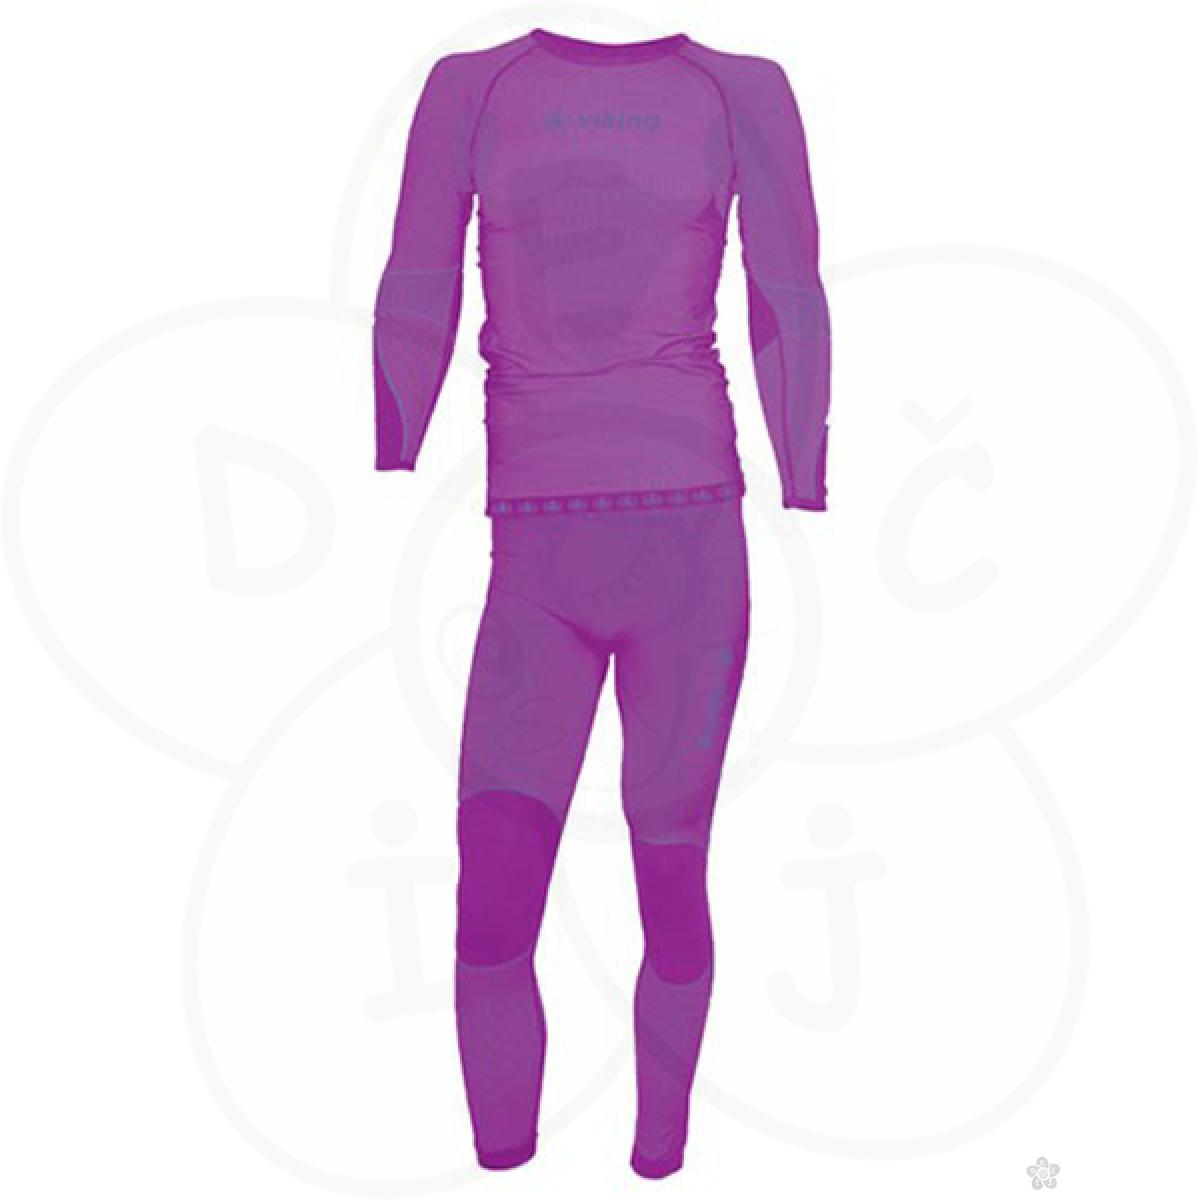 Aktivni veš VIKING RIKO violet 2014, SKI50014303050